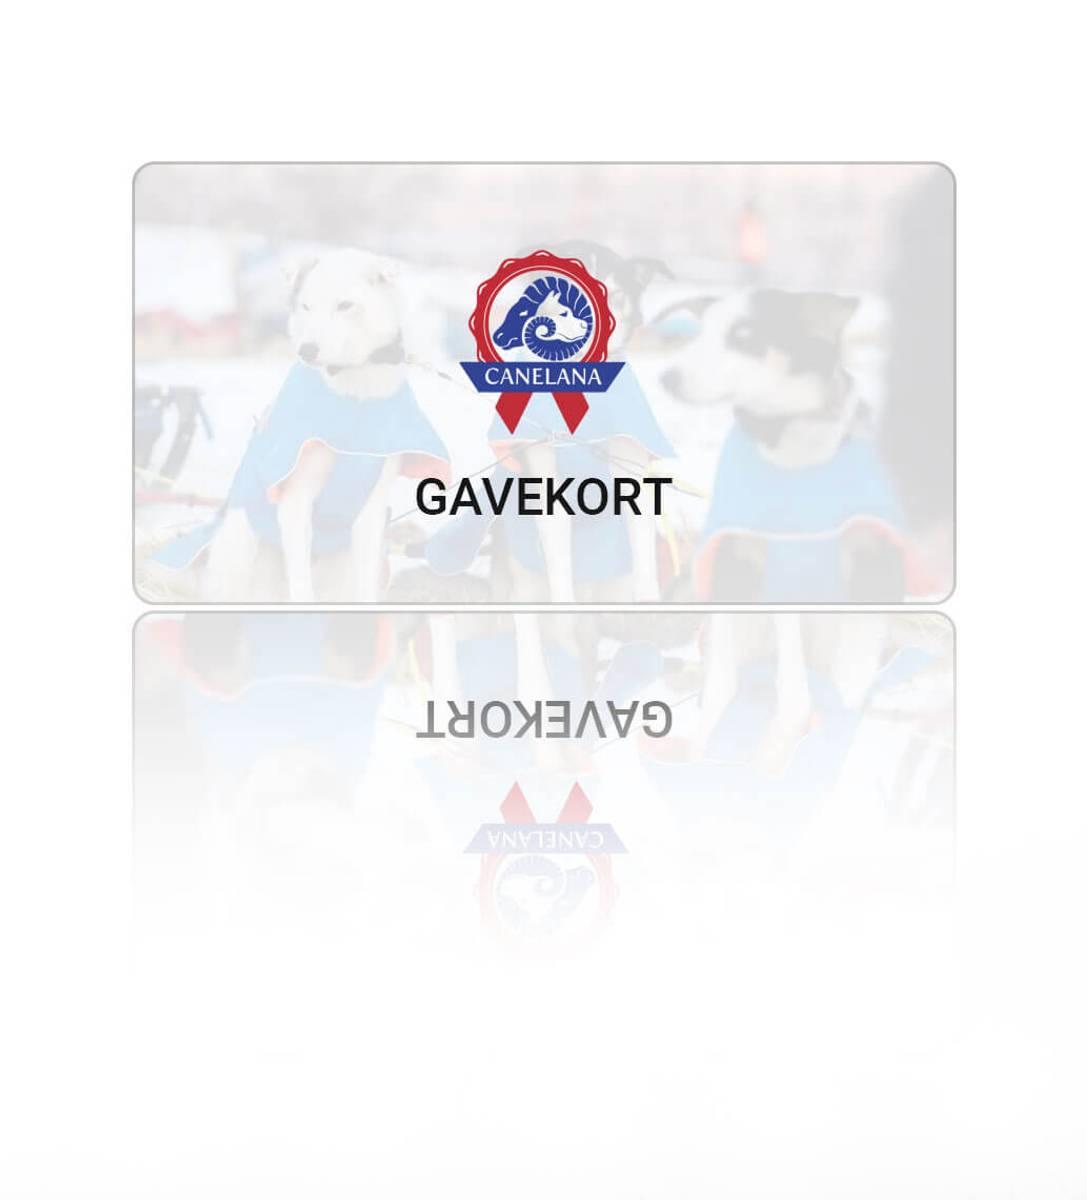 Digitalt Gavekort